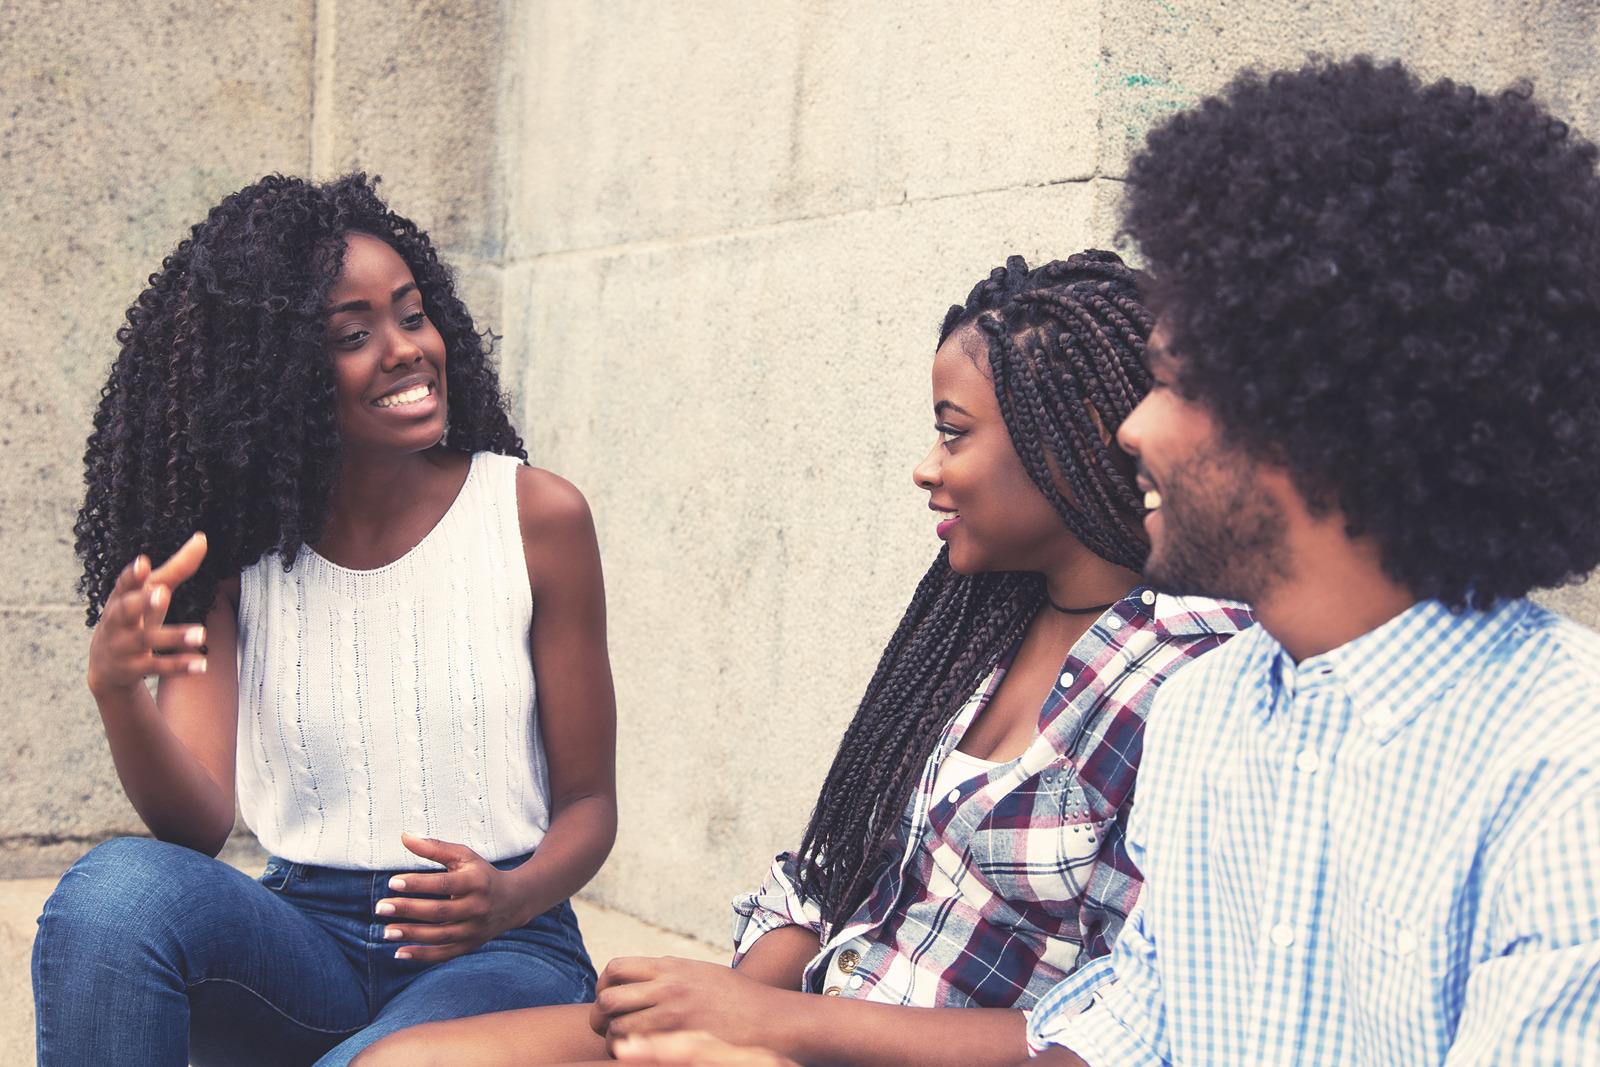 'I Buy Black Too': The Movement Highlighting Black-Owned Businesses In Philadelphia